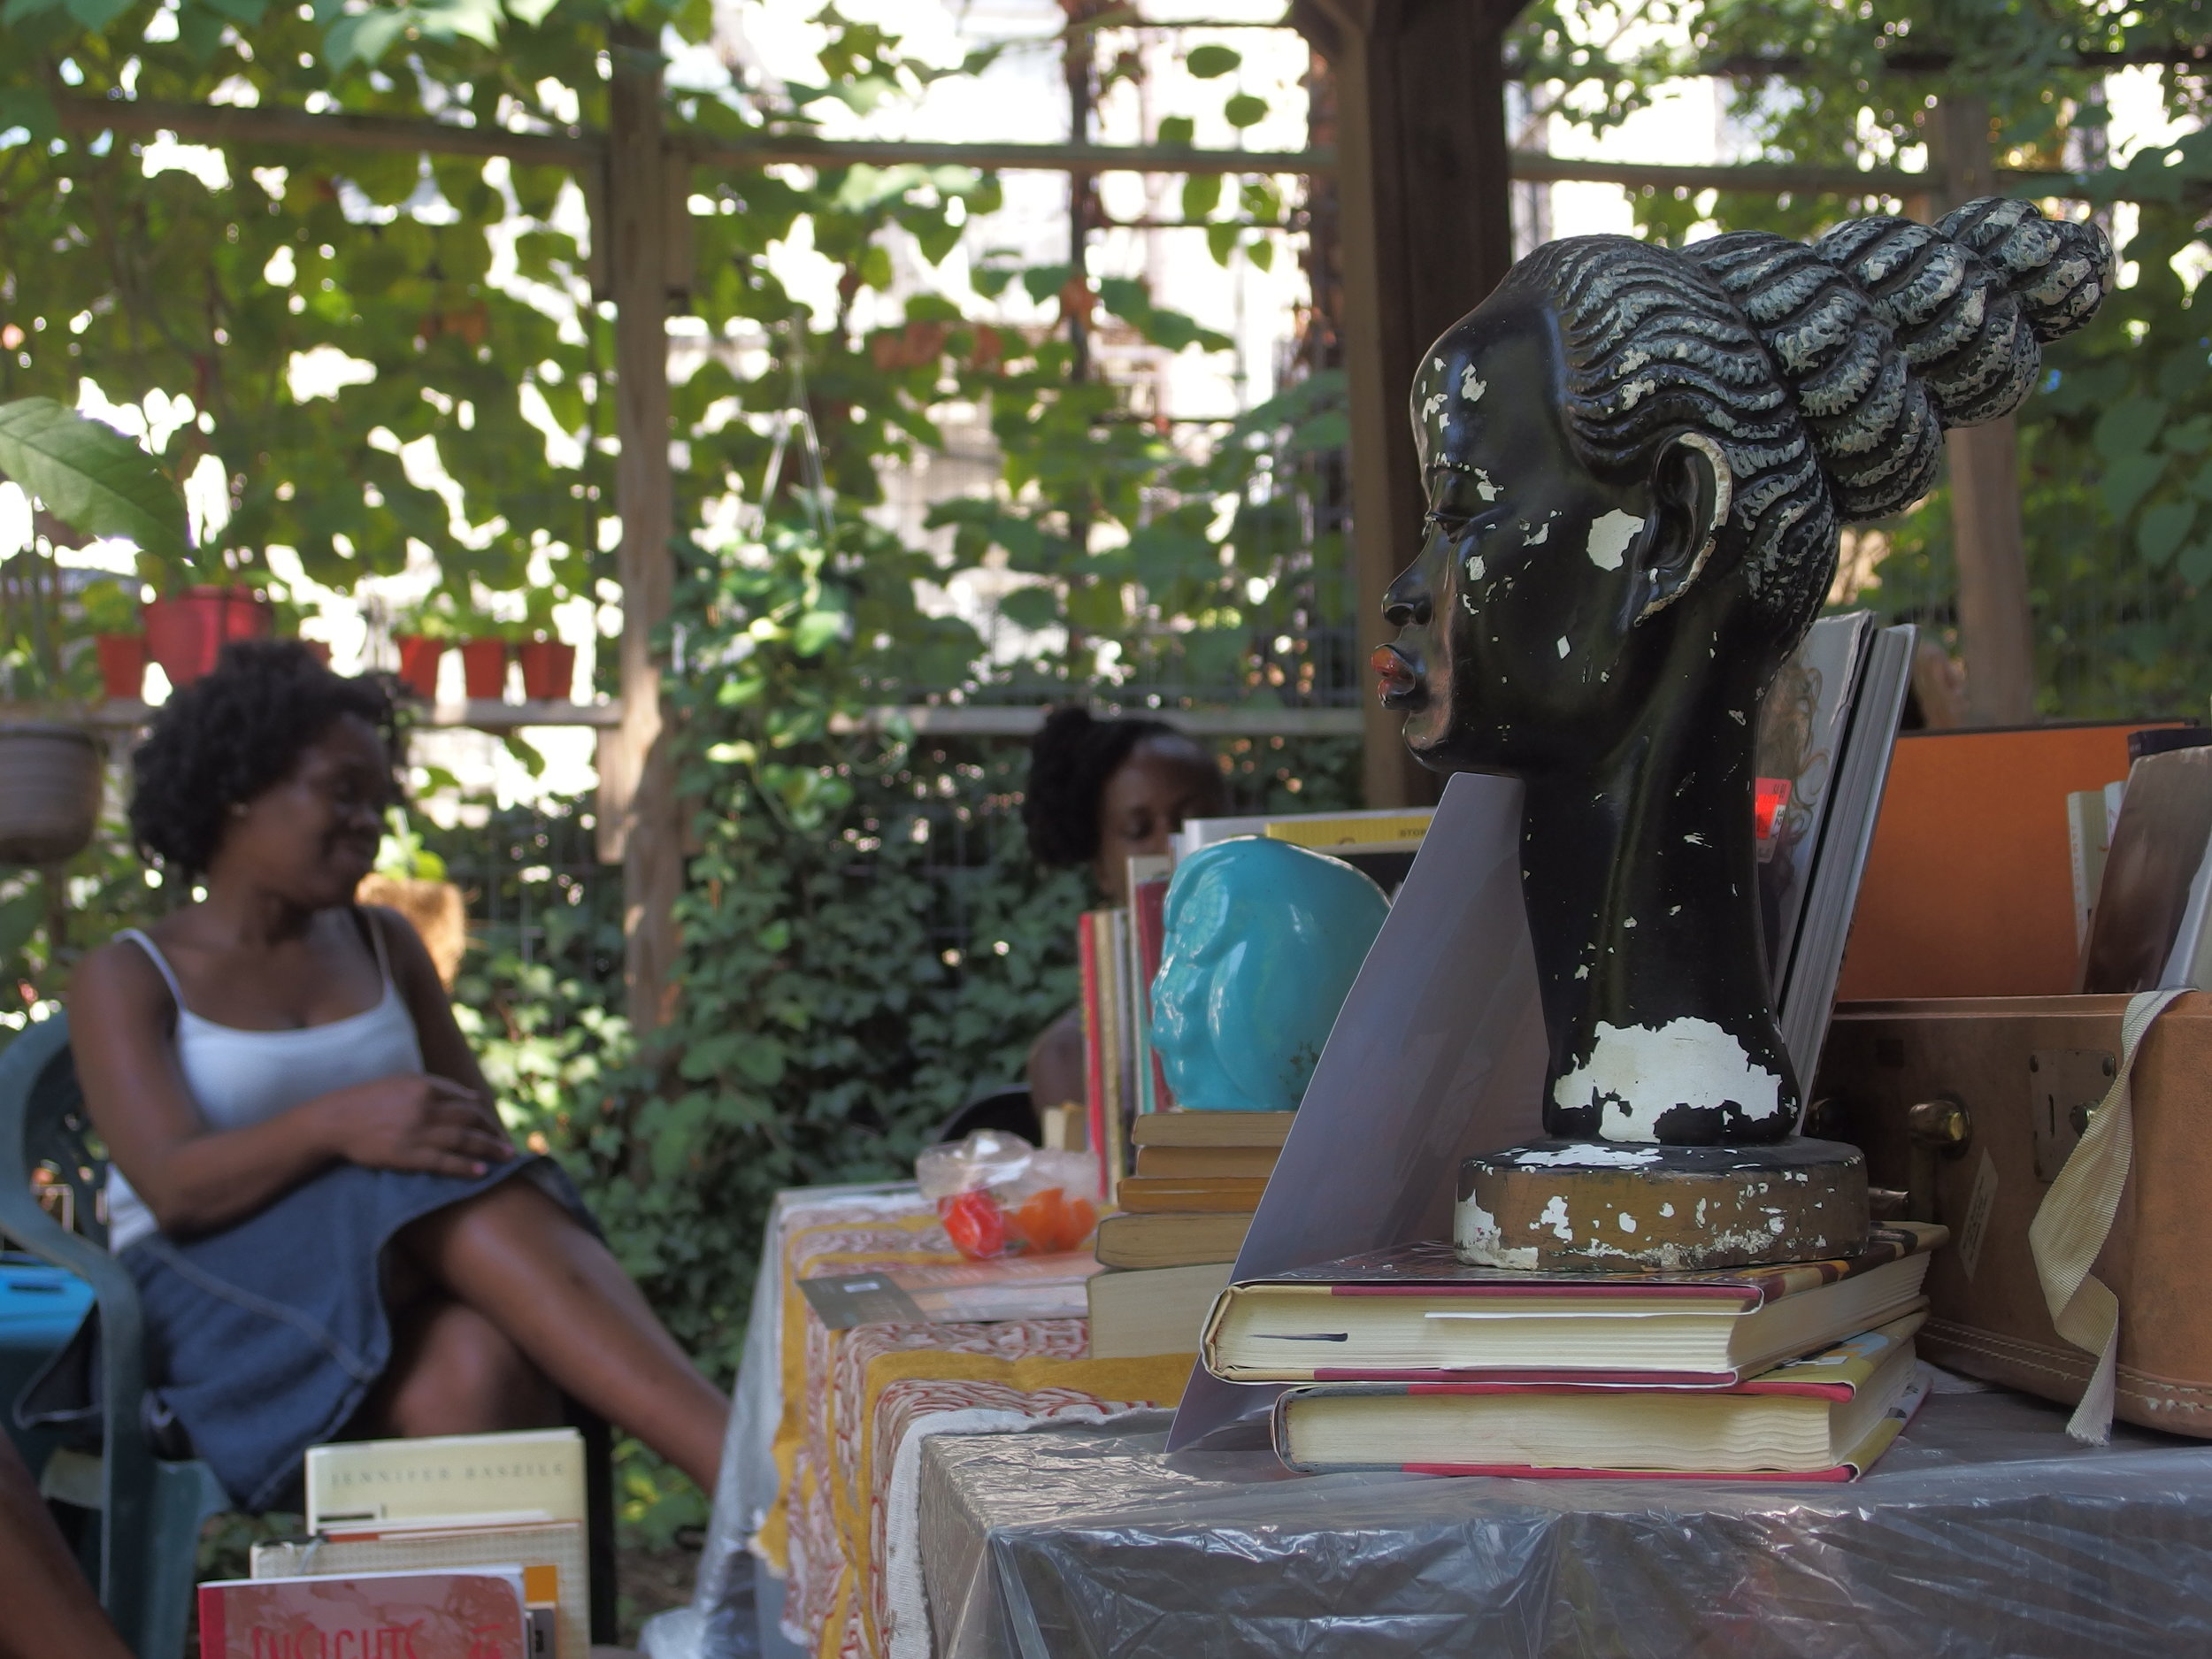 little-free-black-womens-library_20951122445_o.jpg